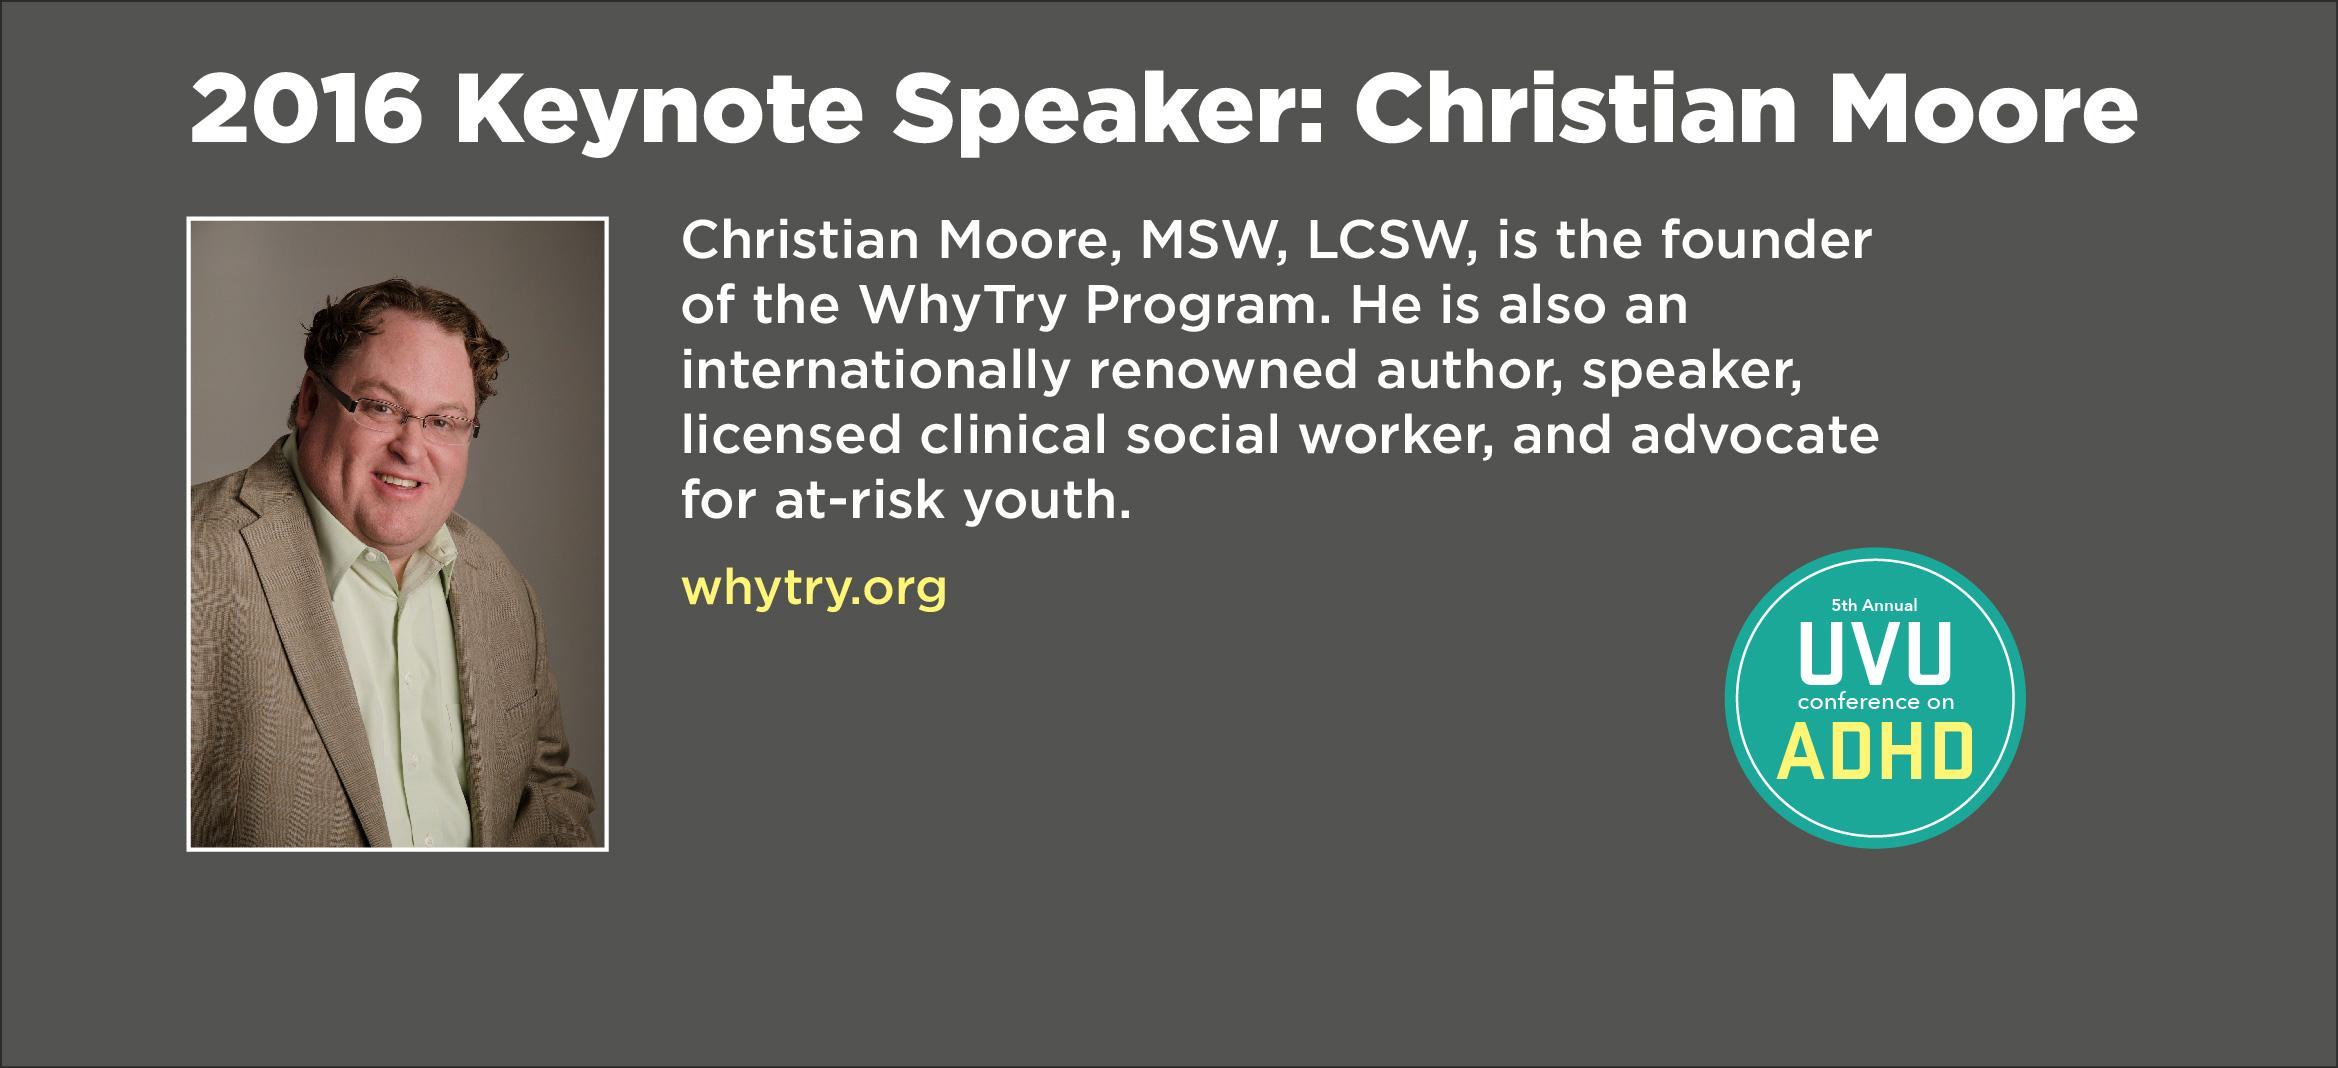 Keynote speaker Christian Moore